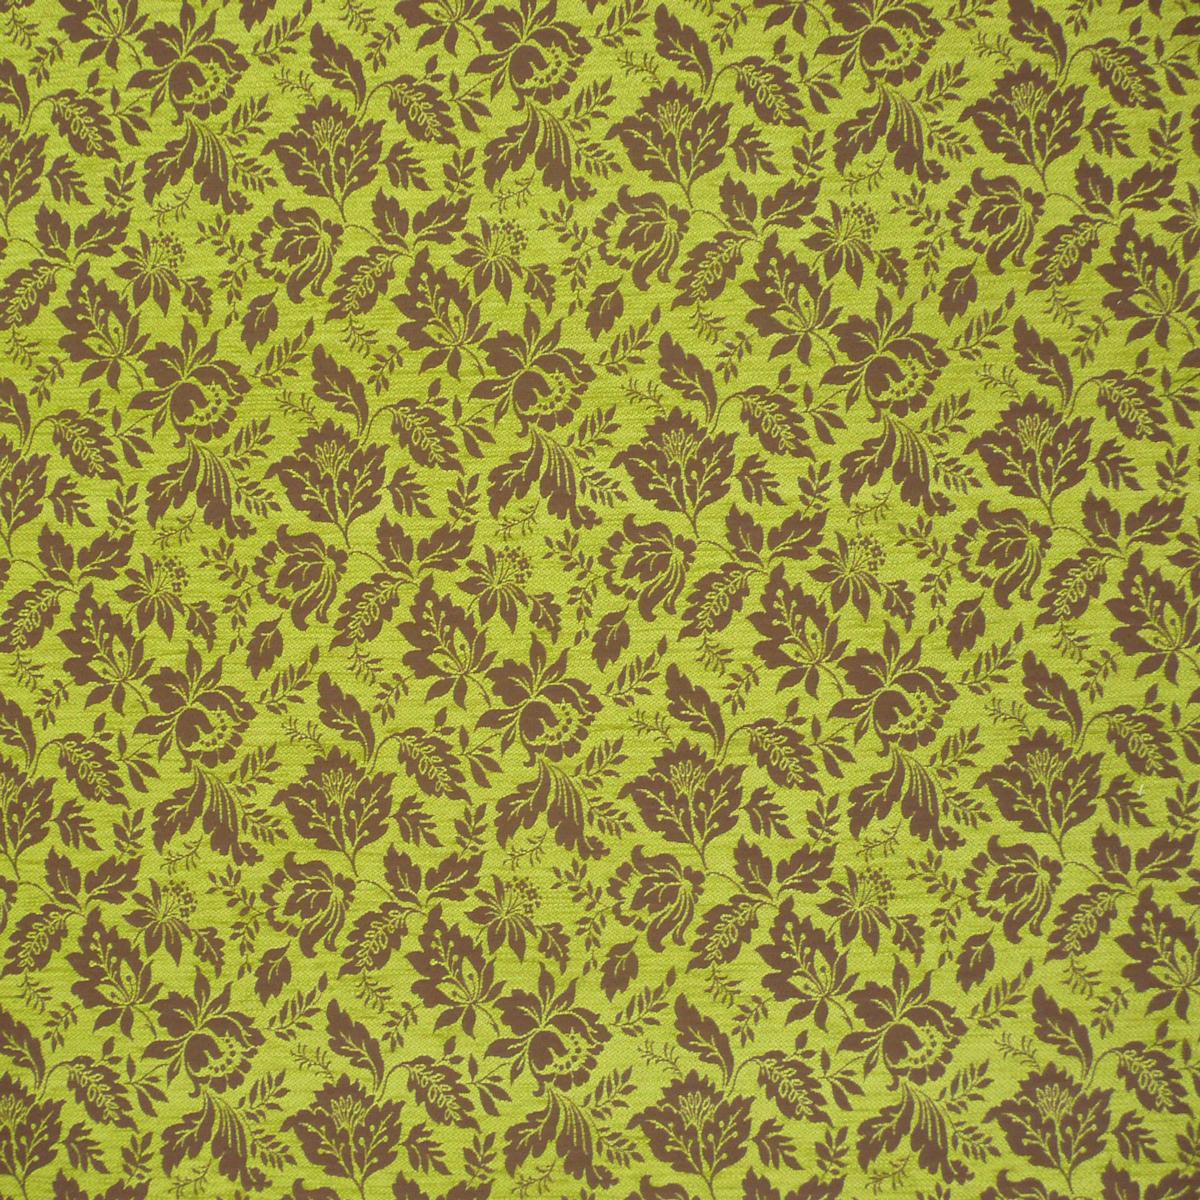 Möbelstoff Bezugsstoff Jacquard WAIBLINGEN Blume braun grün